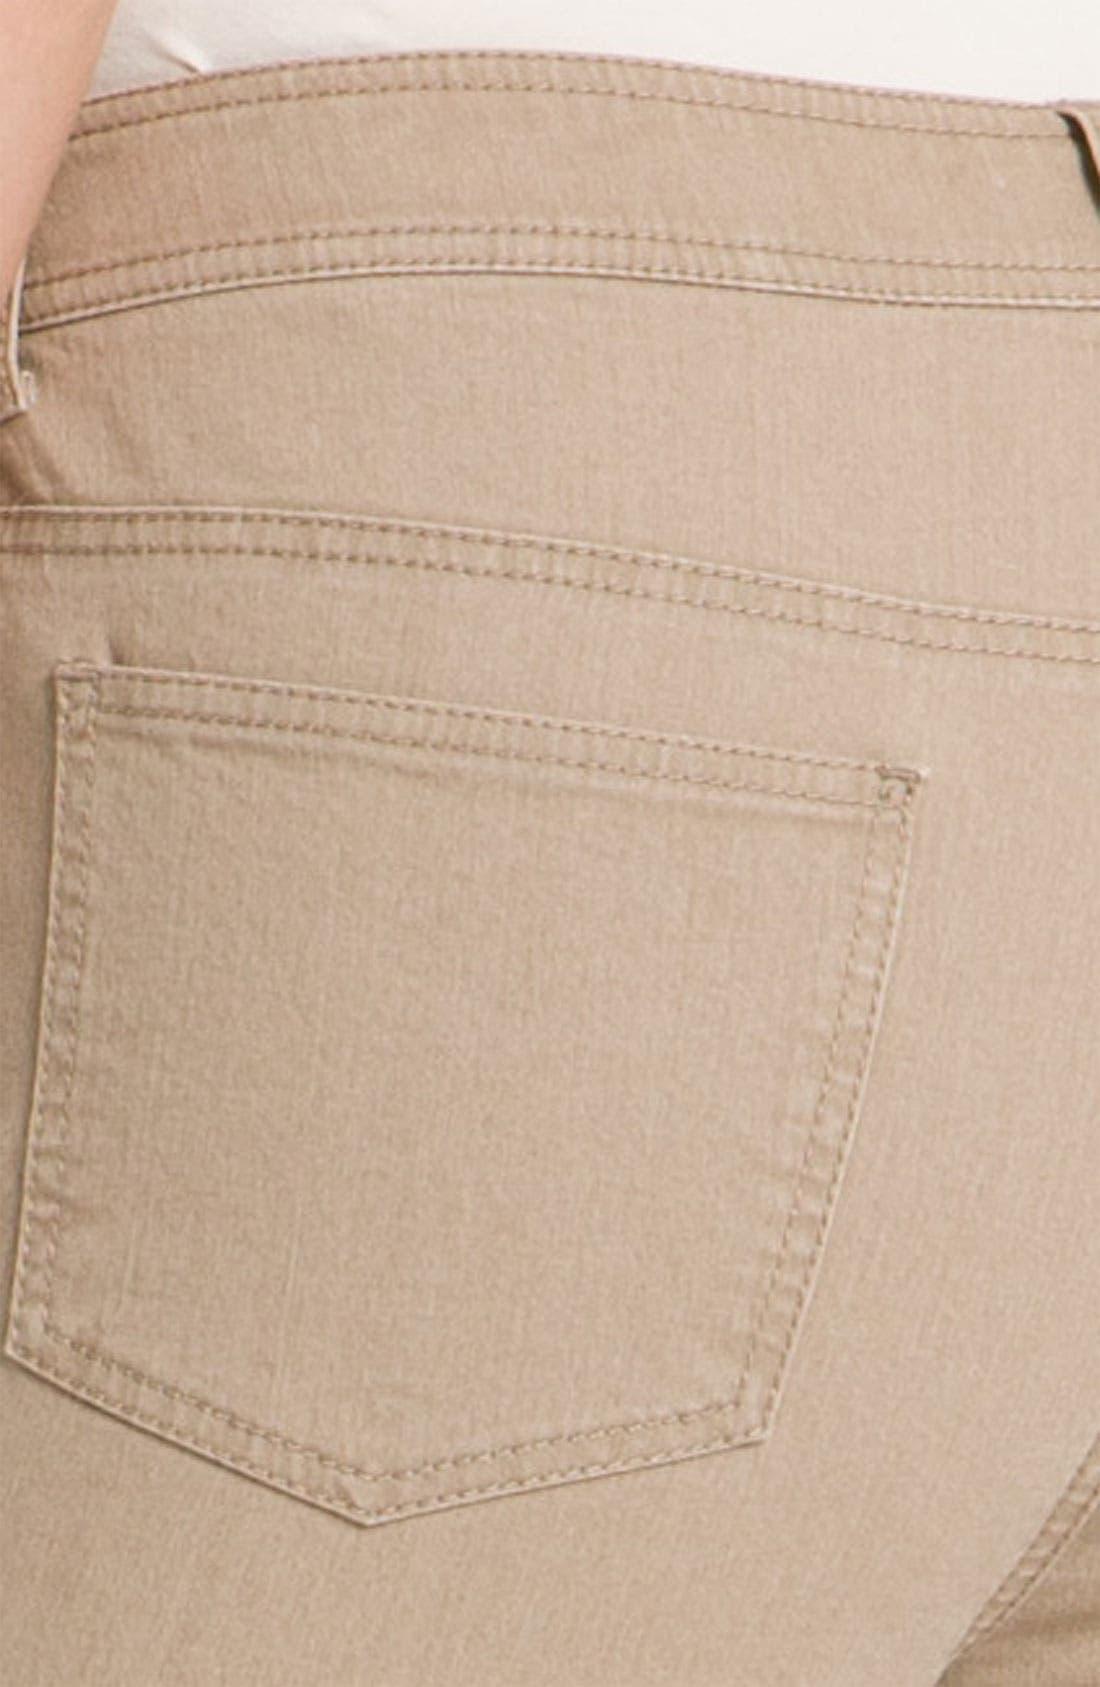 Alternate Image 3  - Lafayette 148 New York Cuff Crop Jeans